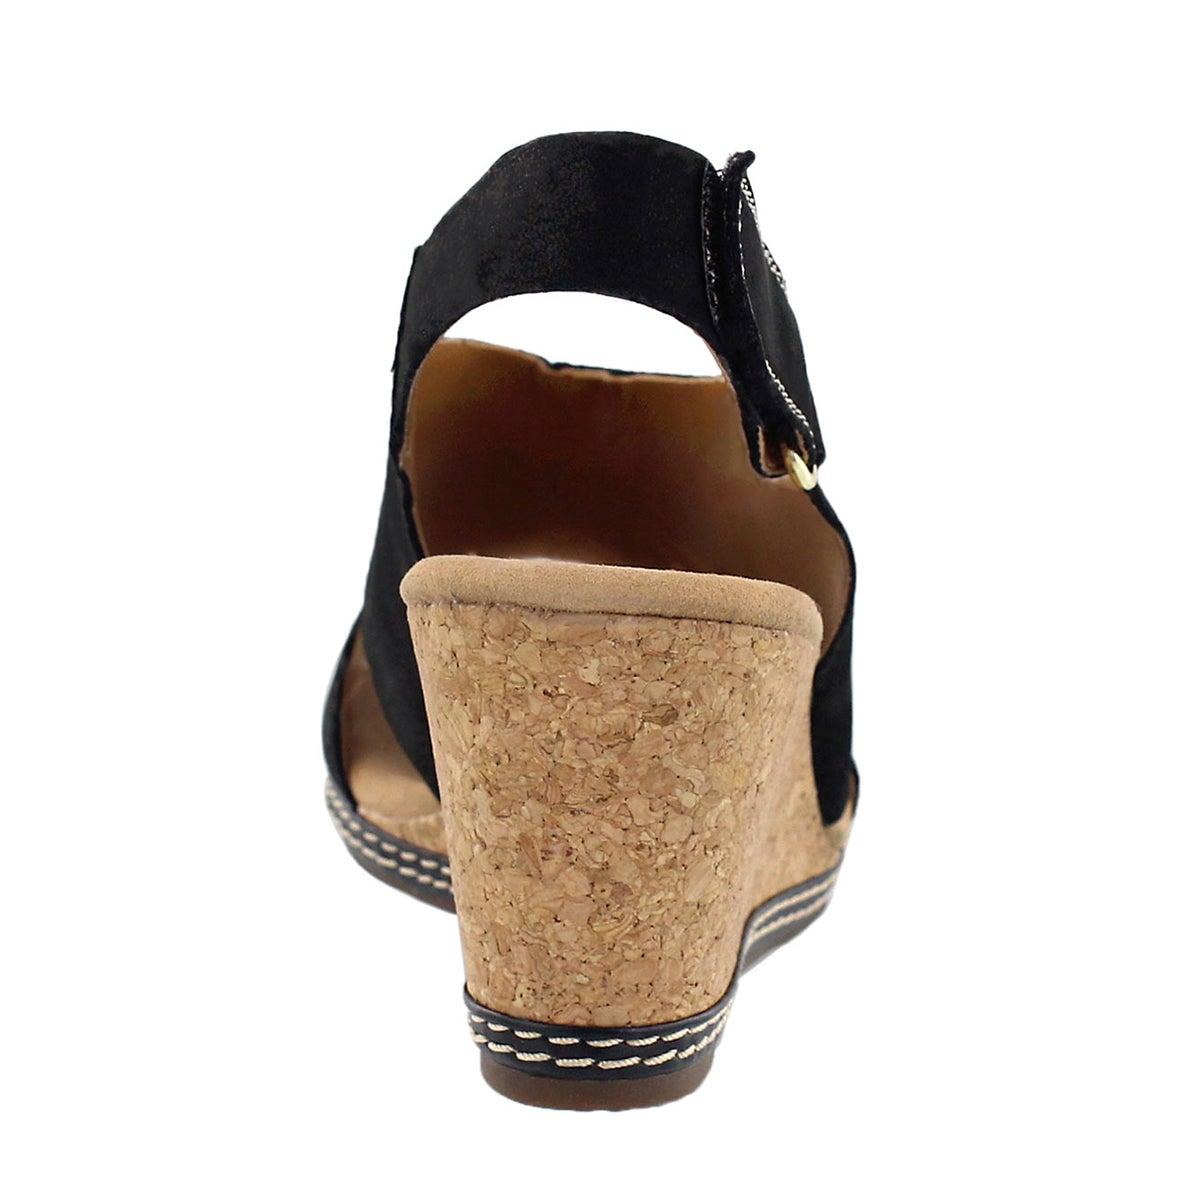 Lds Helio Float black wedge sandal